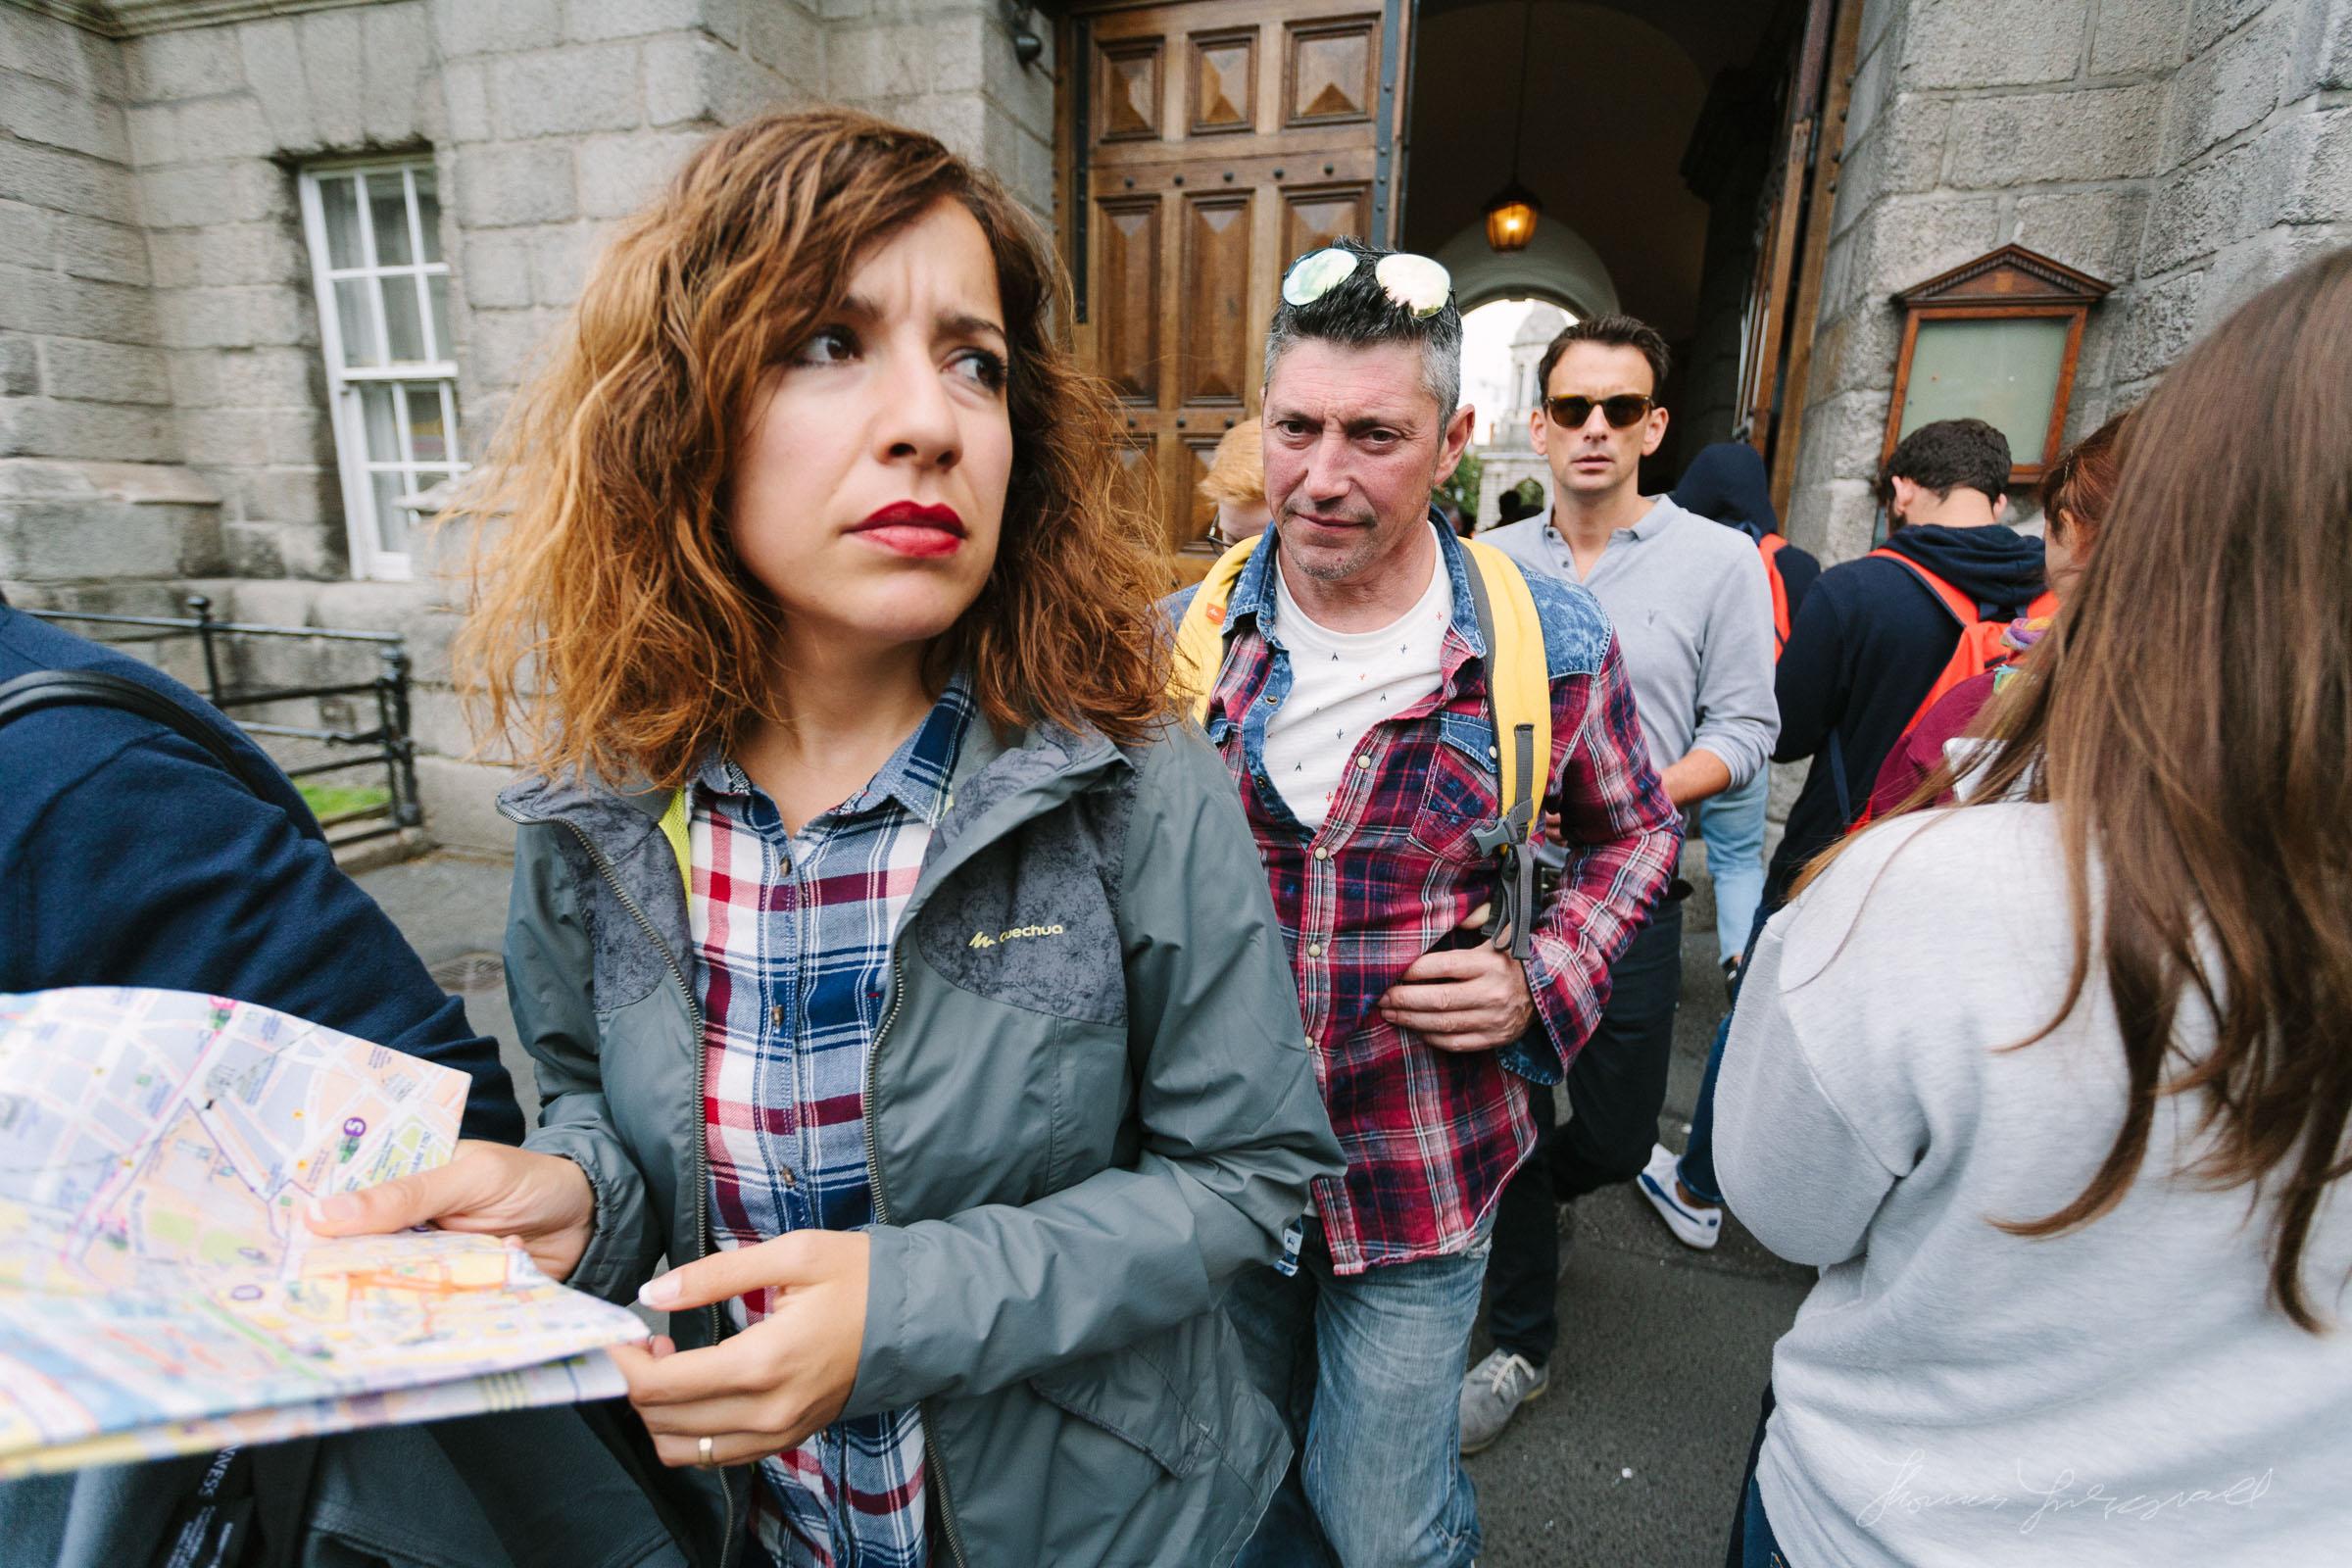 Crowds at Trinity College Dublin, Canon 5d, 17-40mm F4L